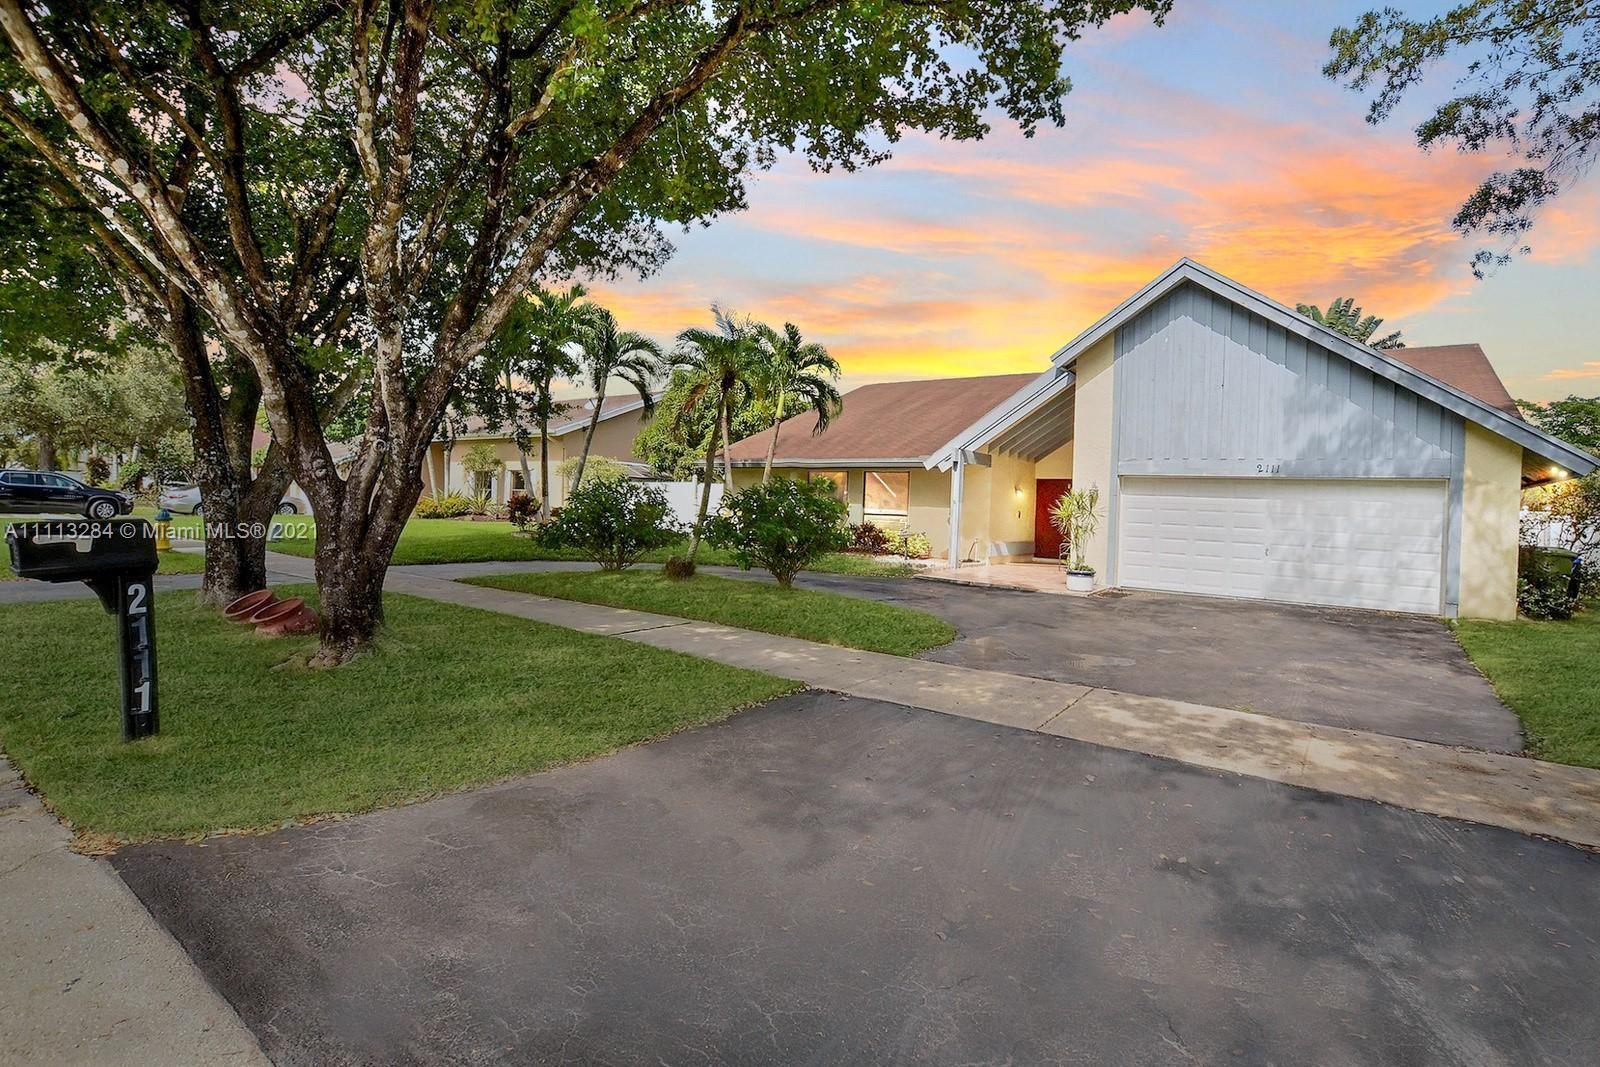 2111 NW 103rd Ave, Pembroke Pines, FL 33026 - #: A11113284